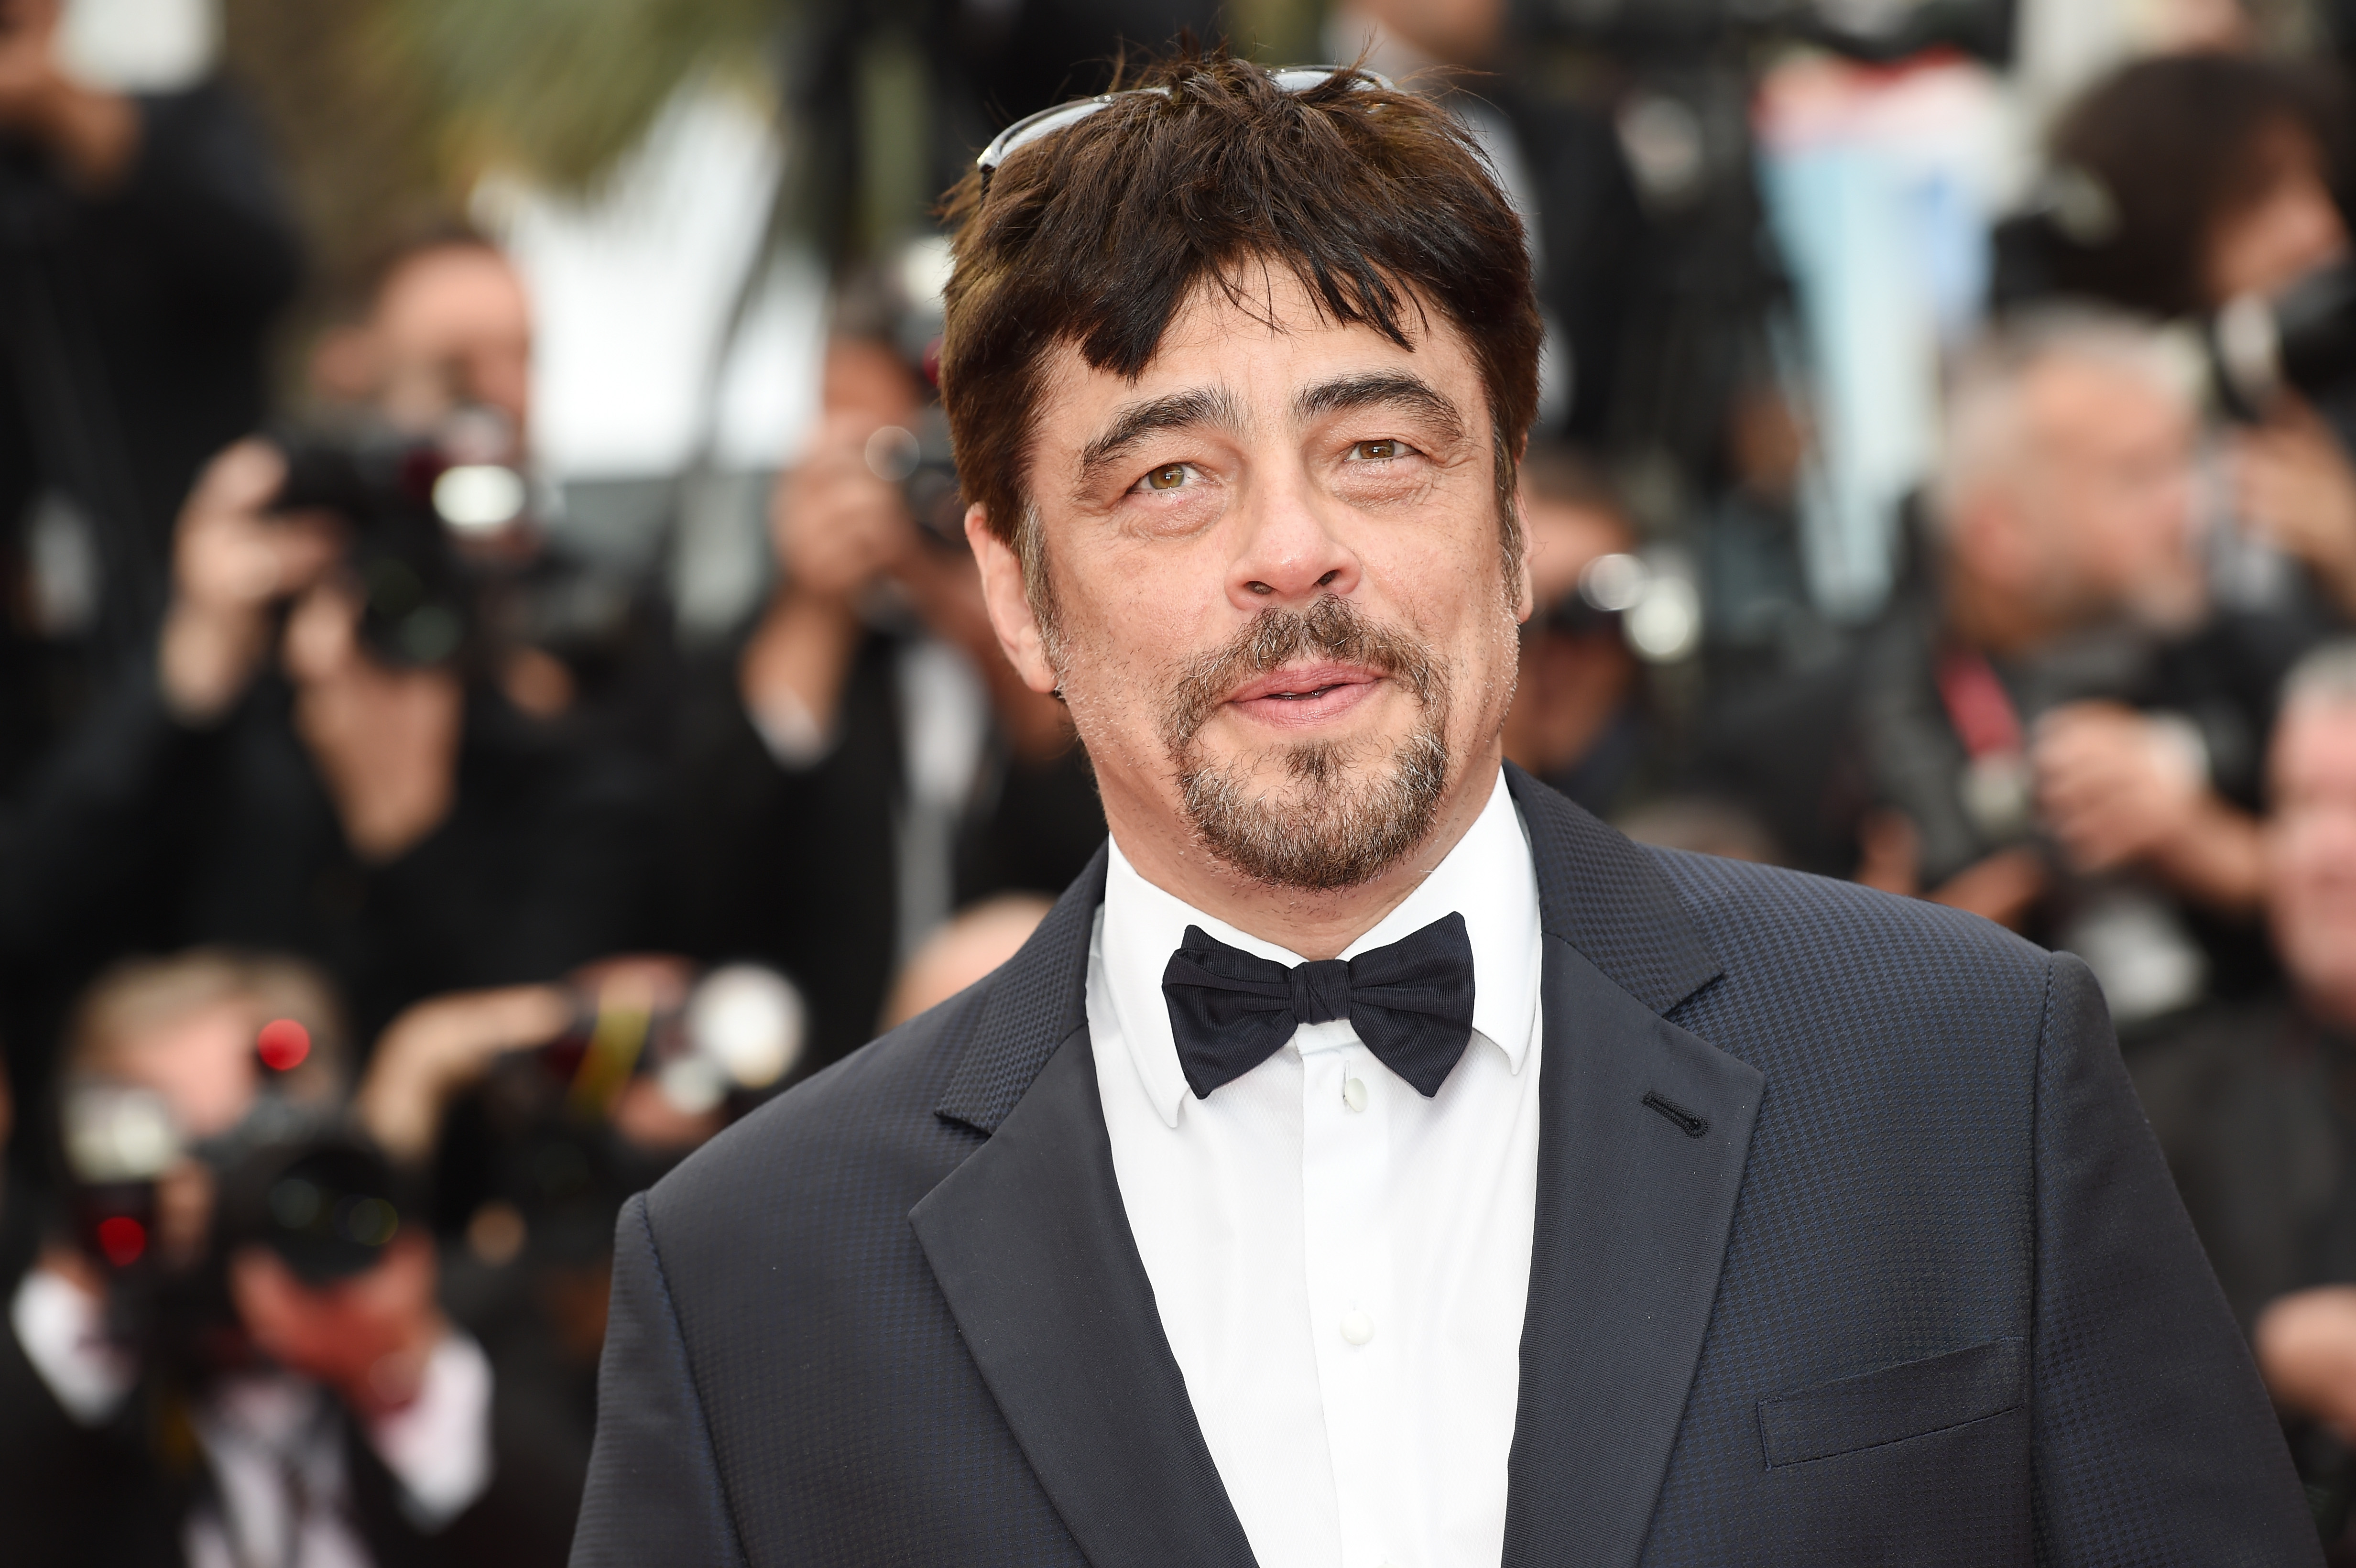 Benicio Del Toro Joins Live-Action 'Dora the Explorer' Movie as its Main Villain, Swiper